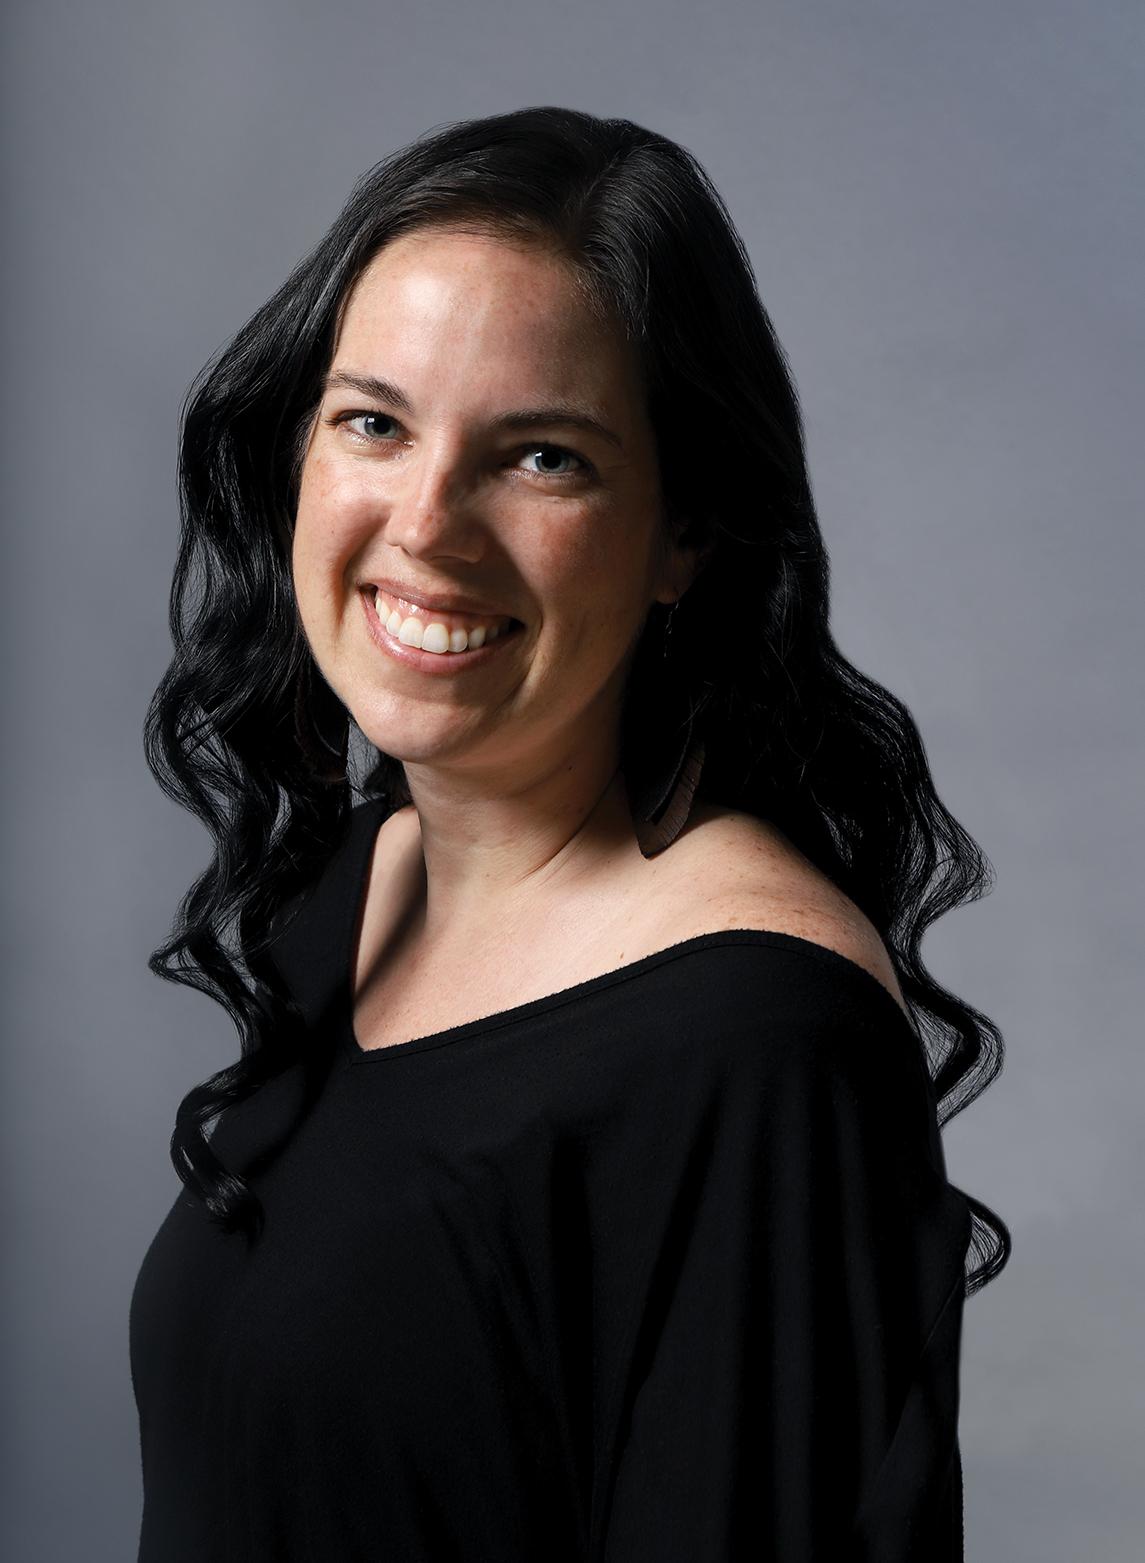 Melissa Miller Curley